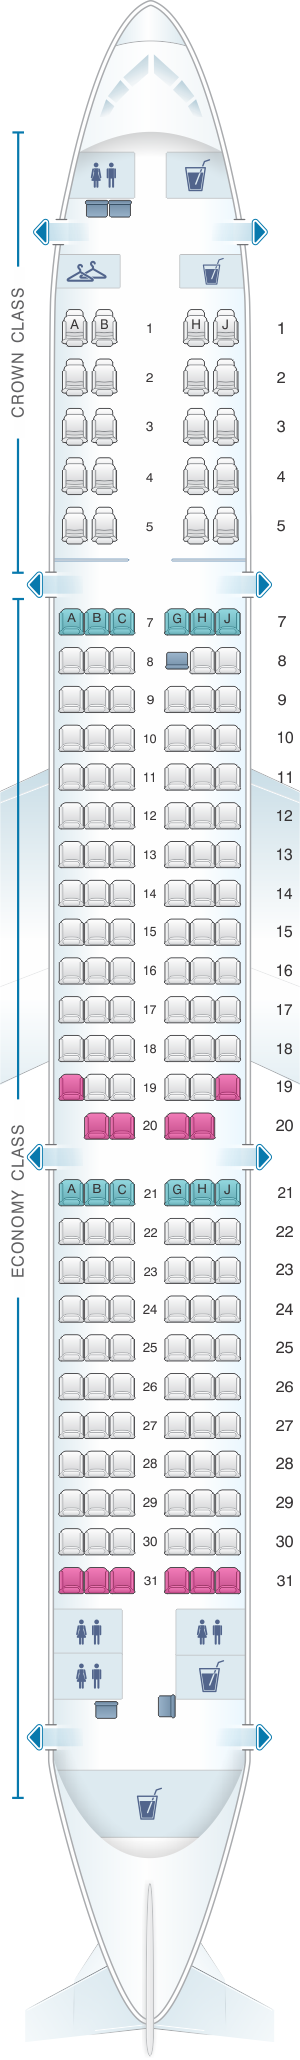 Seat map for Royal Jordanian Airbus A321 200